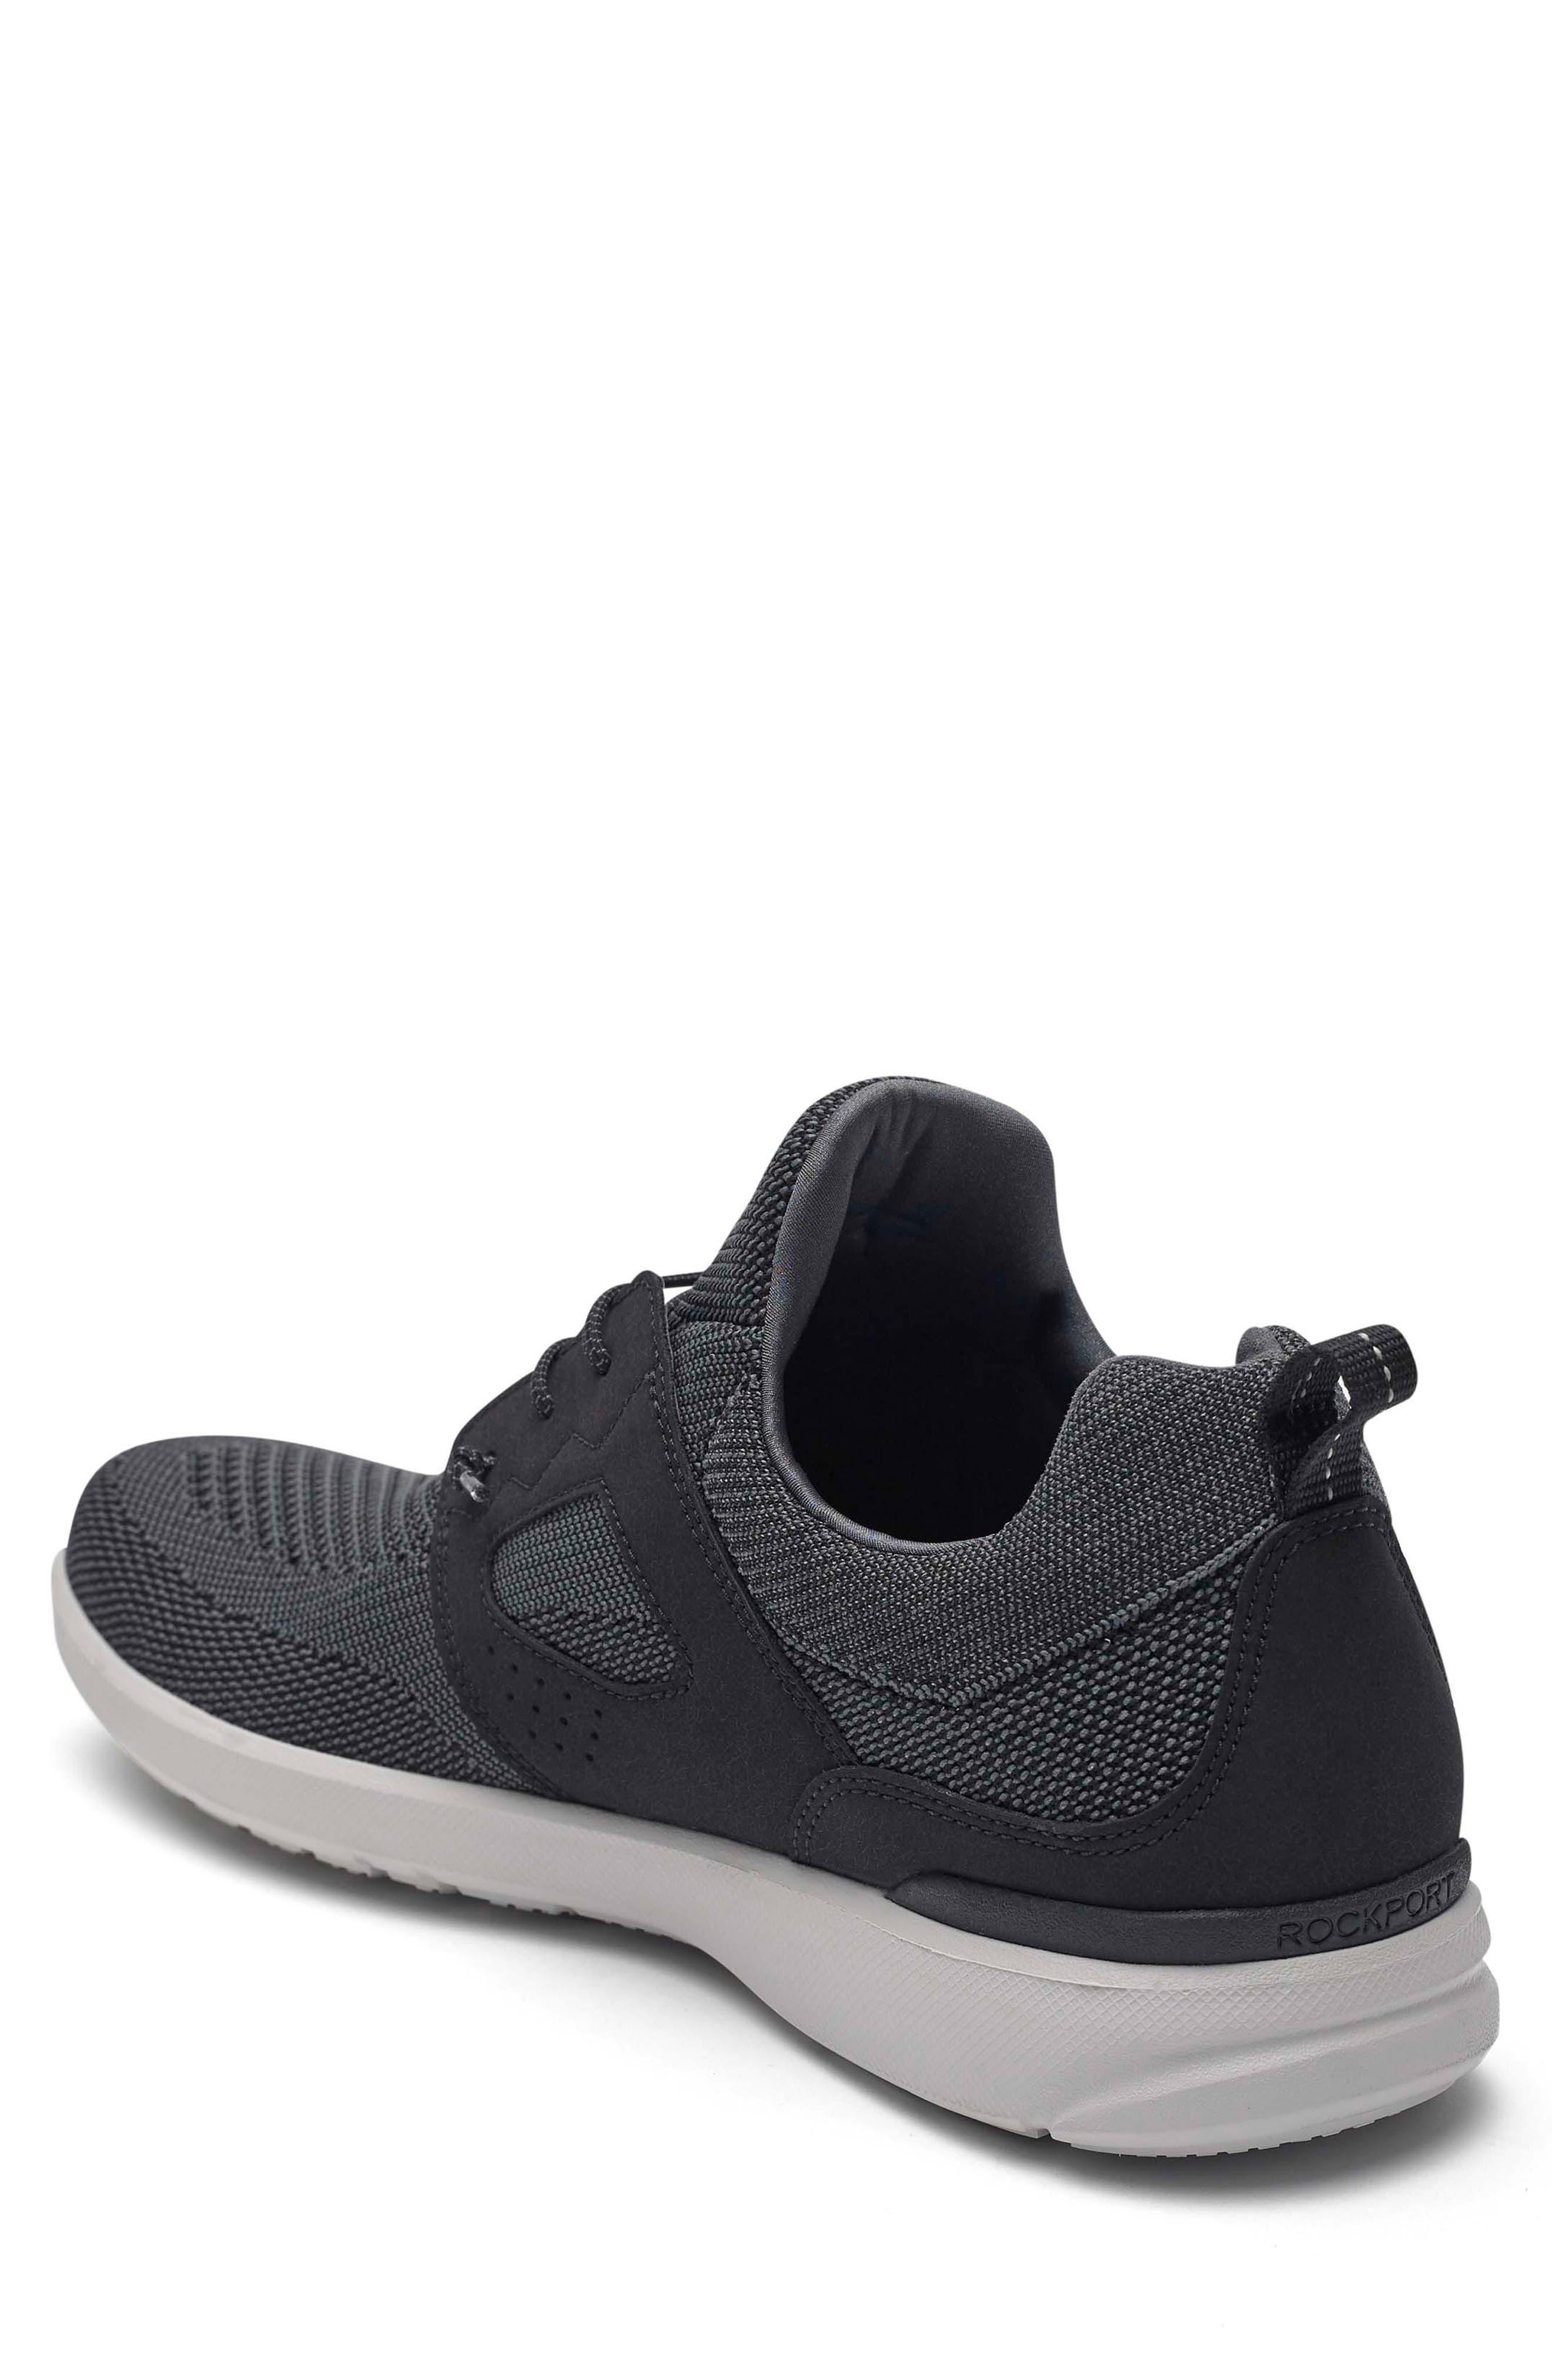 truFlex Sneaker,                             Alternate thumbnail 2, color,                             001